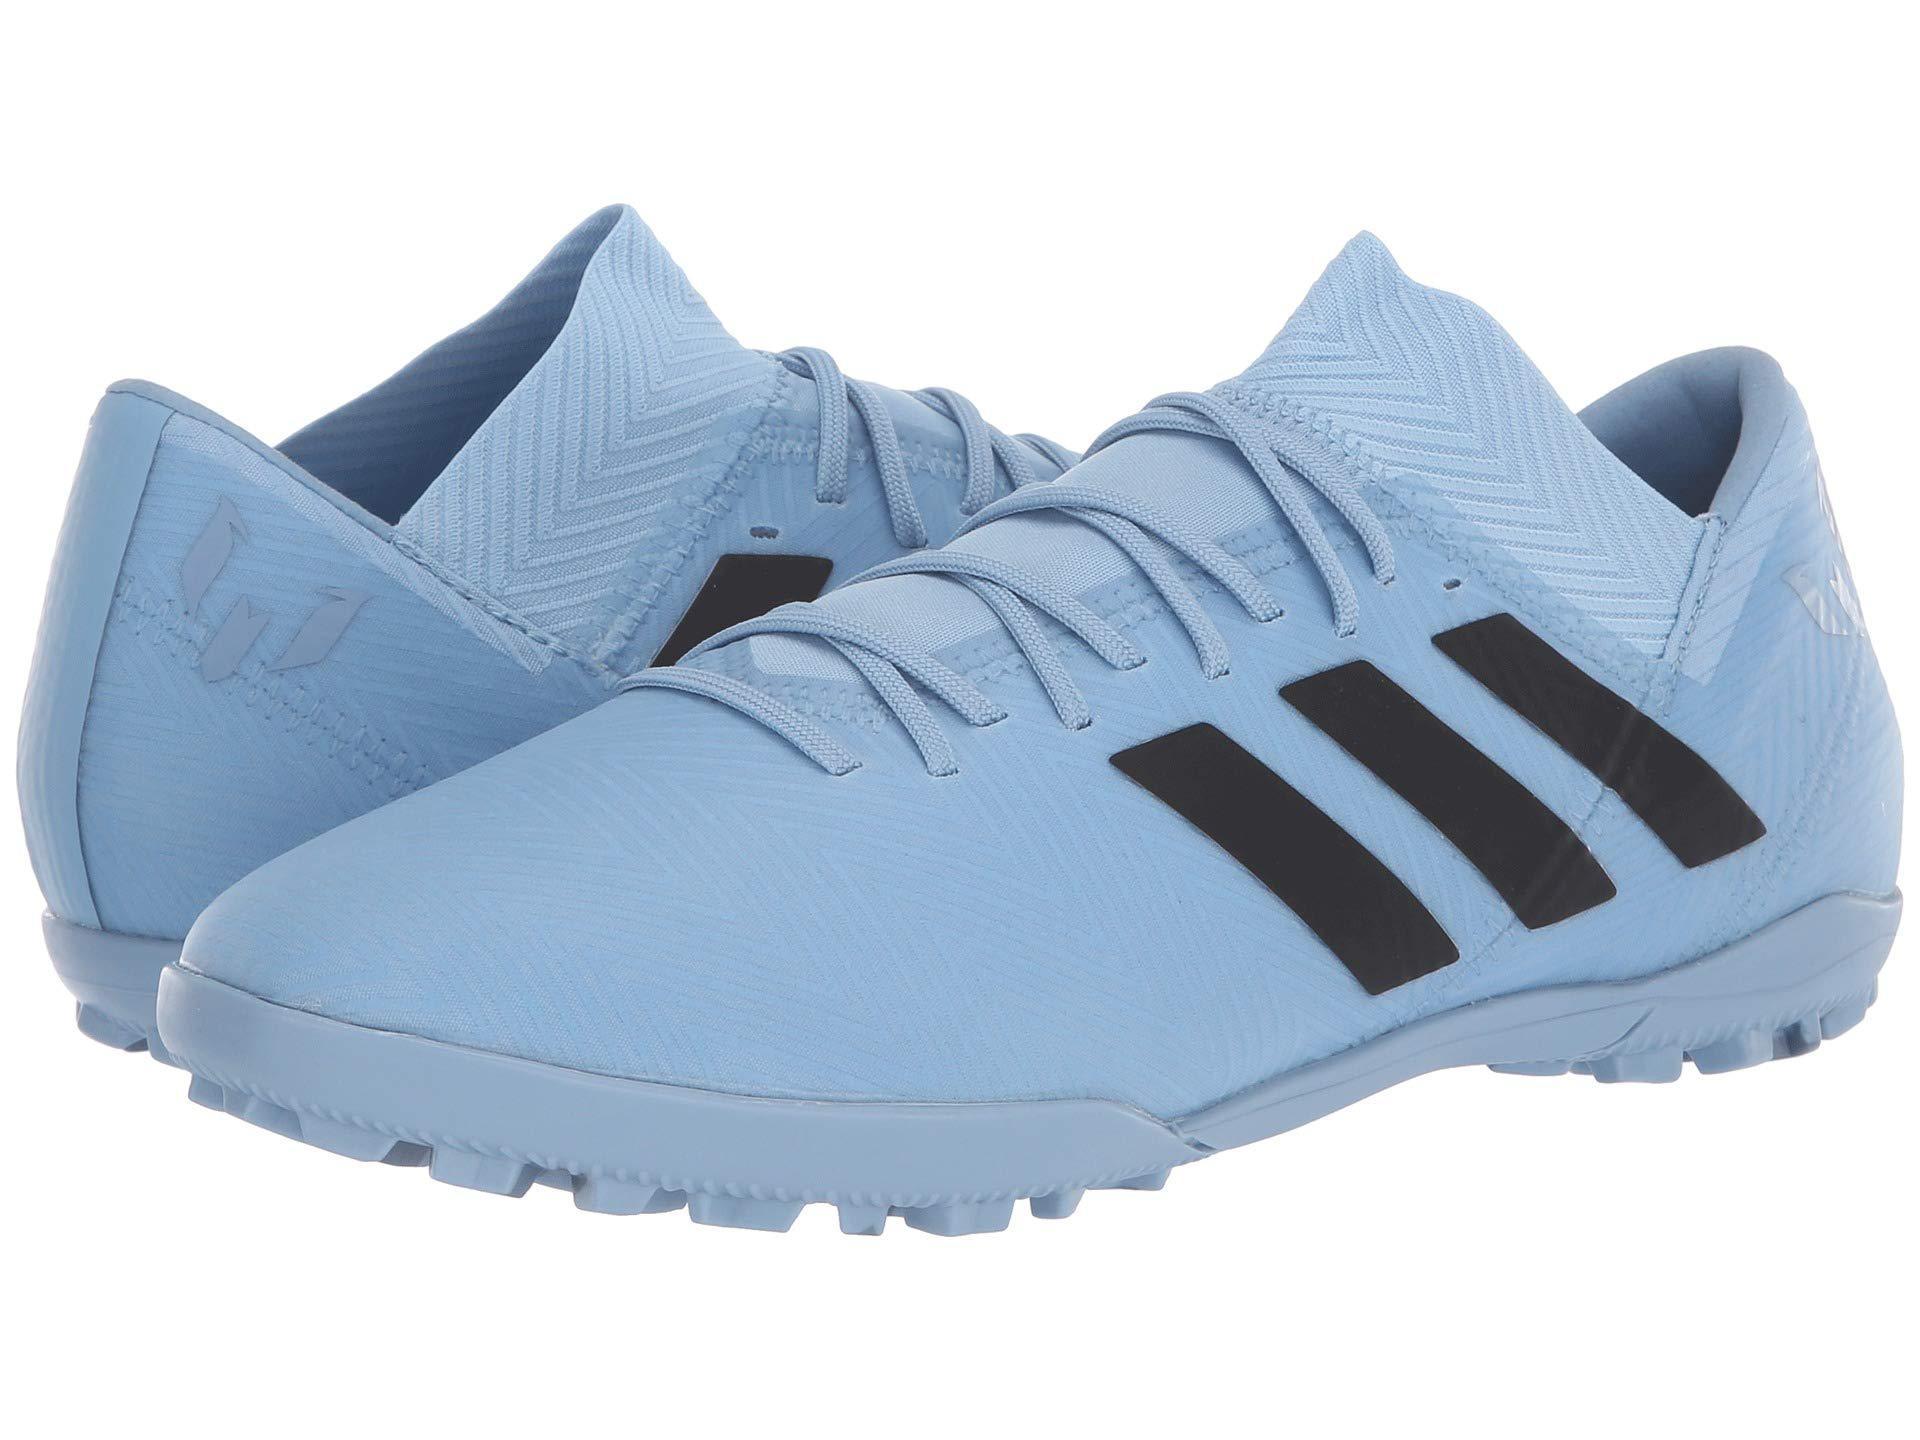 0eae9cb20d50 adidas Nemeziz Messi Tango 18.3 Tf (ash Blue/black/raw Grey) Men's ...